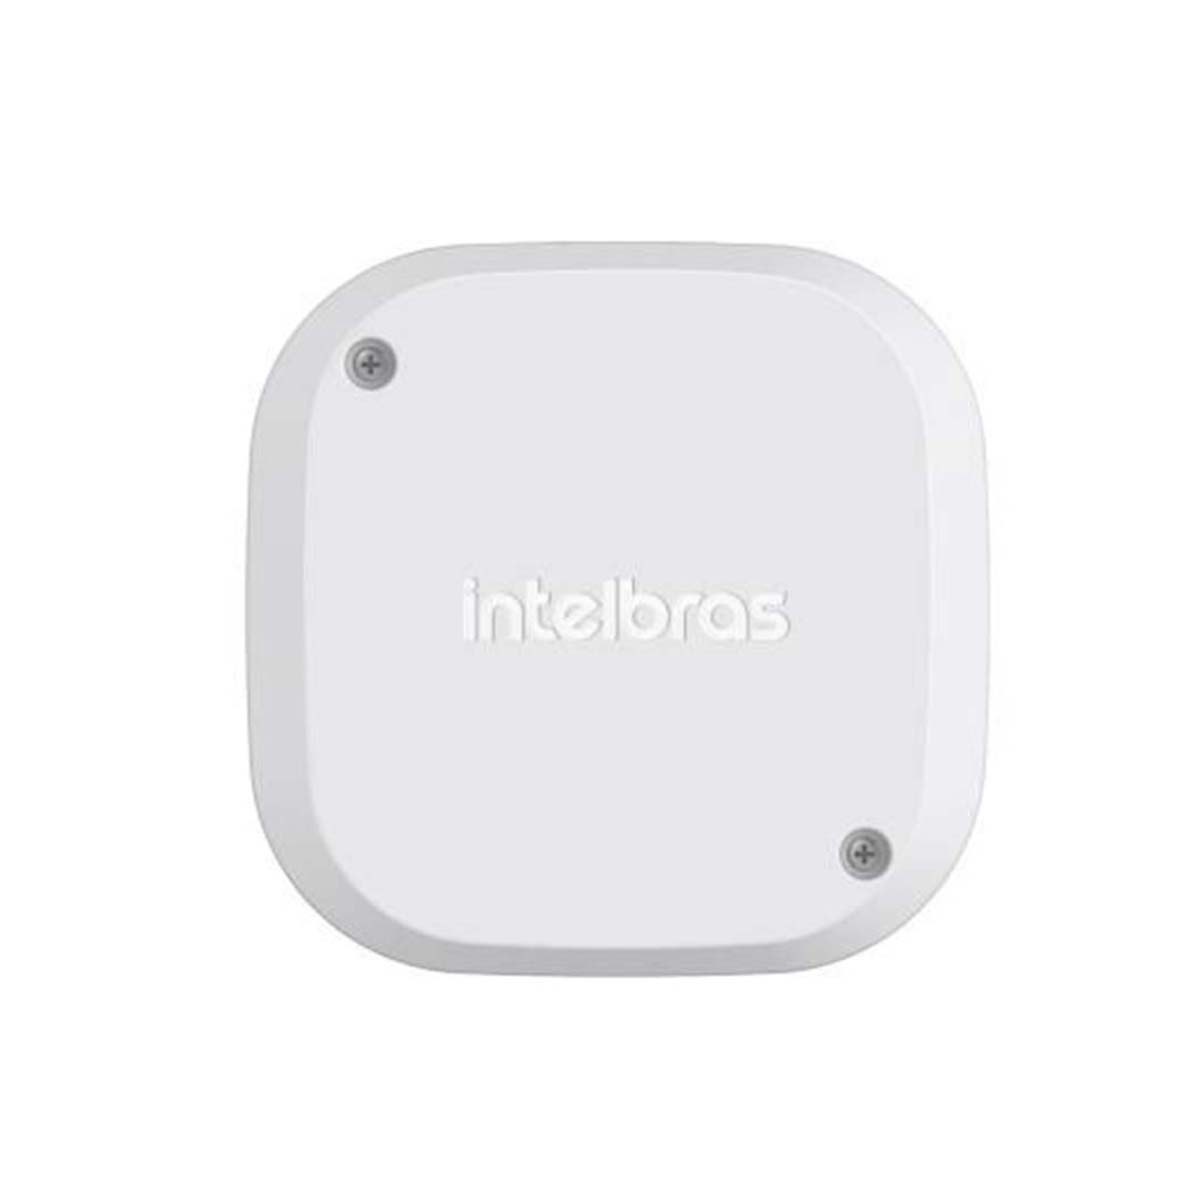 KIT 05 CAIXA PLASTICA DE PASSAGEM VBOX 1100 INTELBRAS